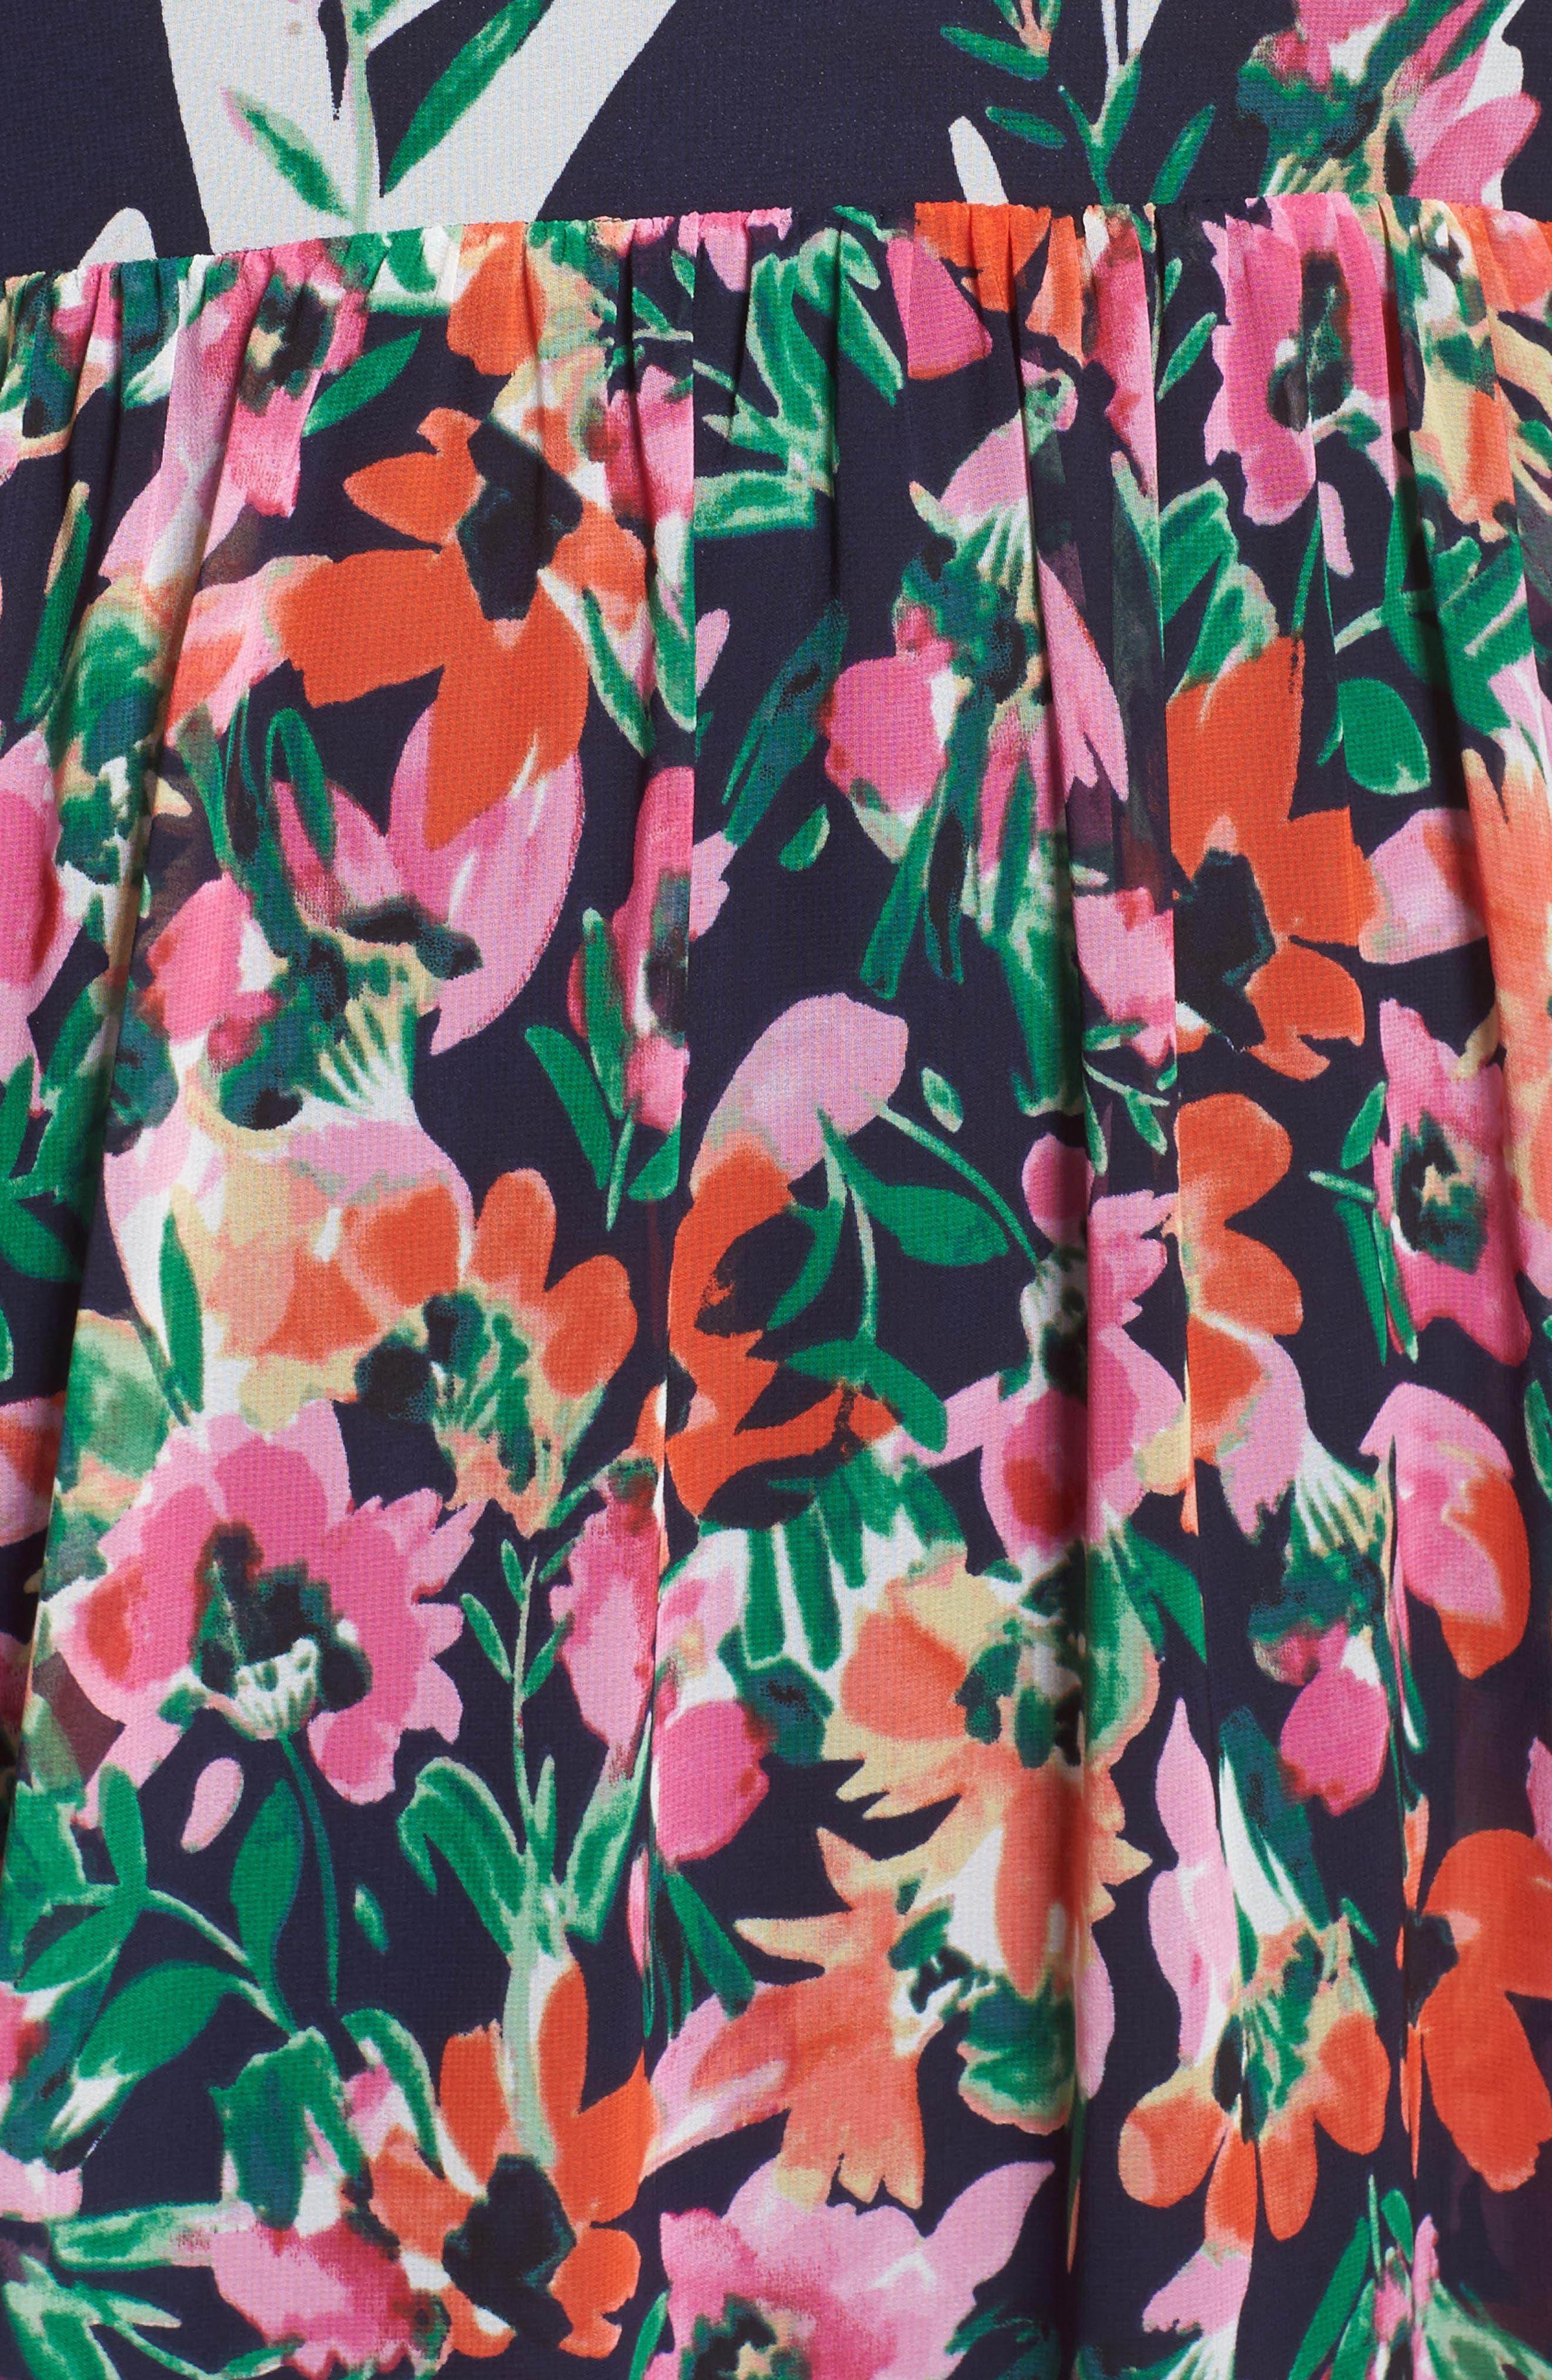 Floral Halter Chiffon Maxi Dress,                             Alternate thumbnail 6, color,                             NAVY/ PINK